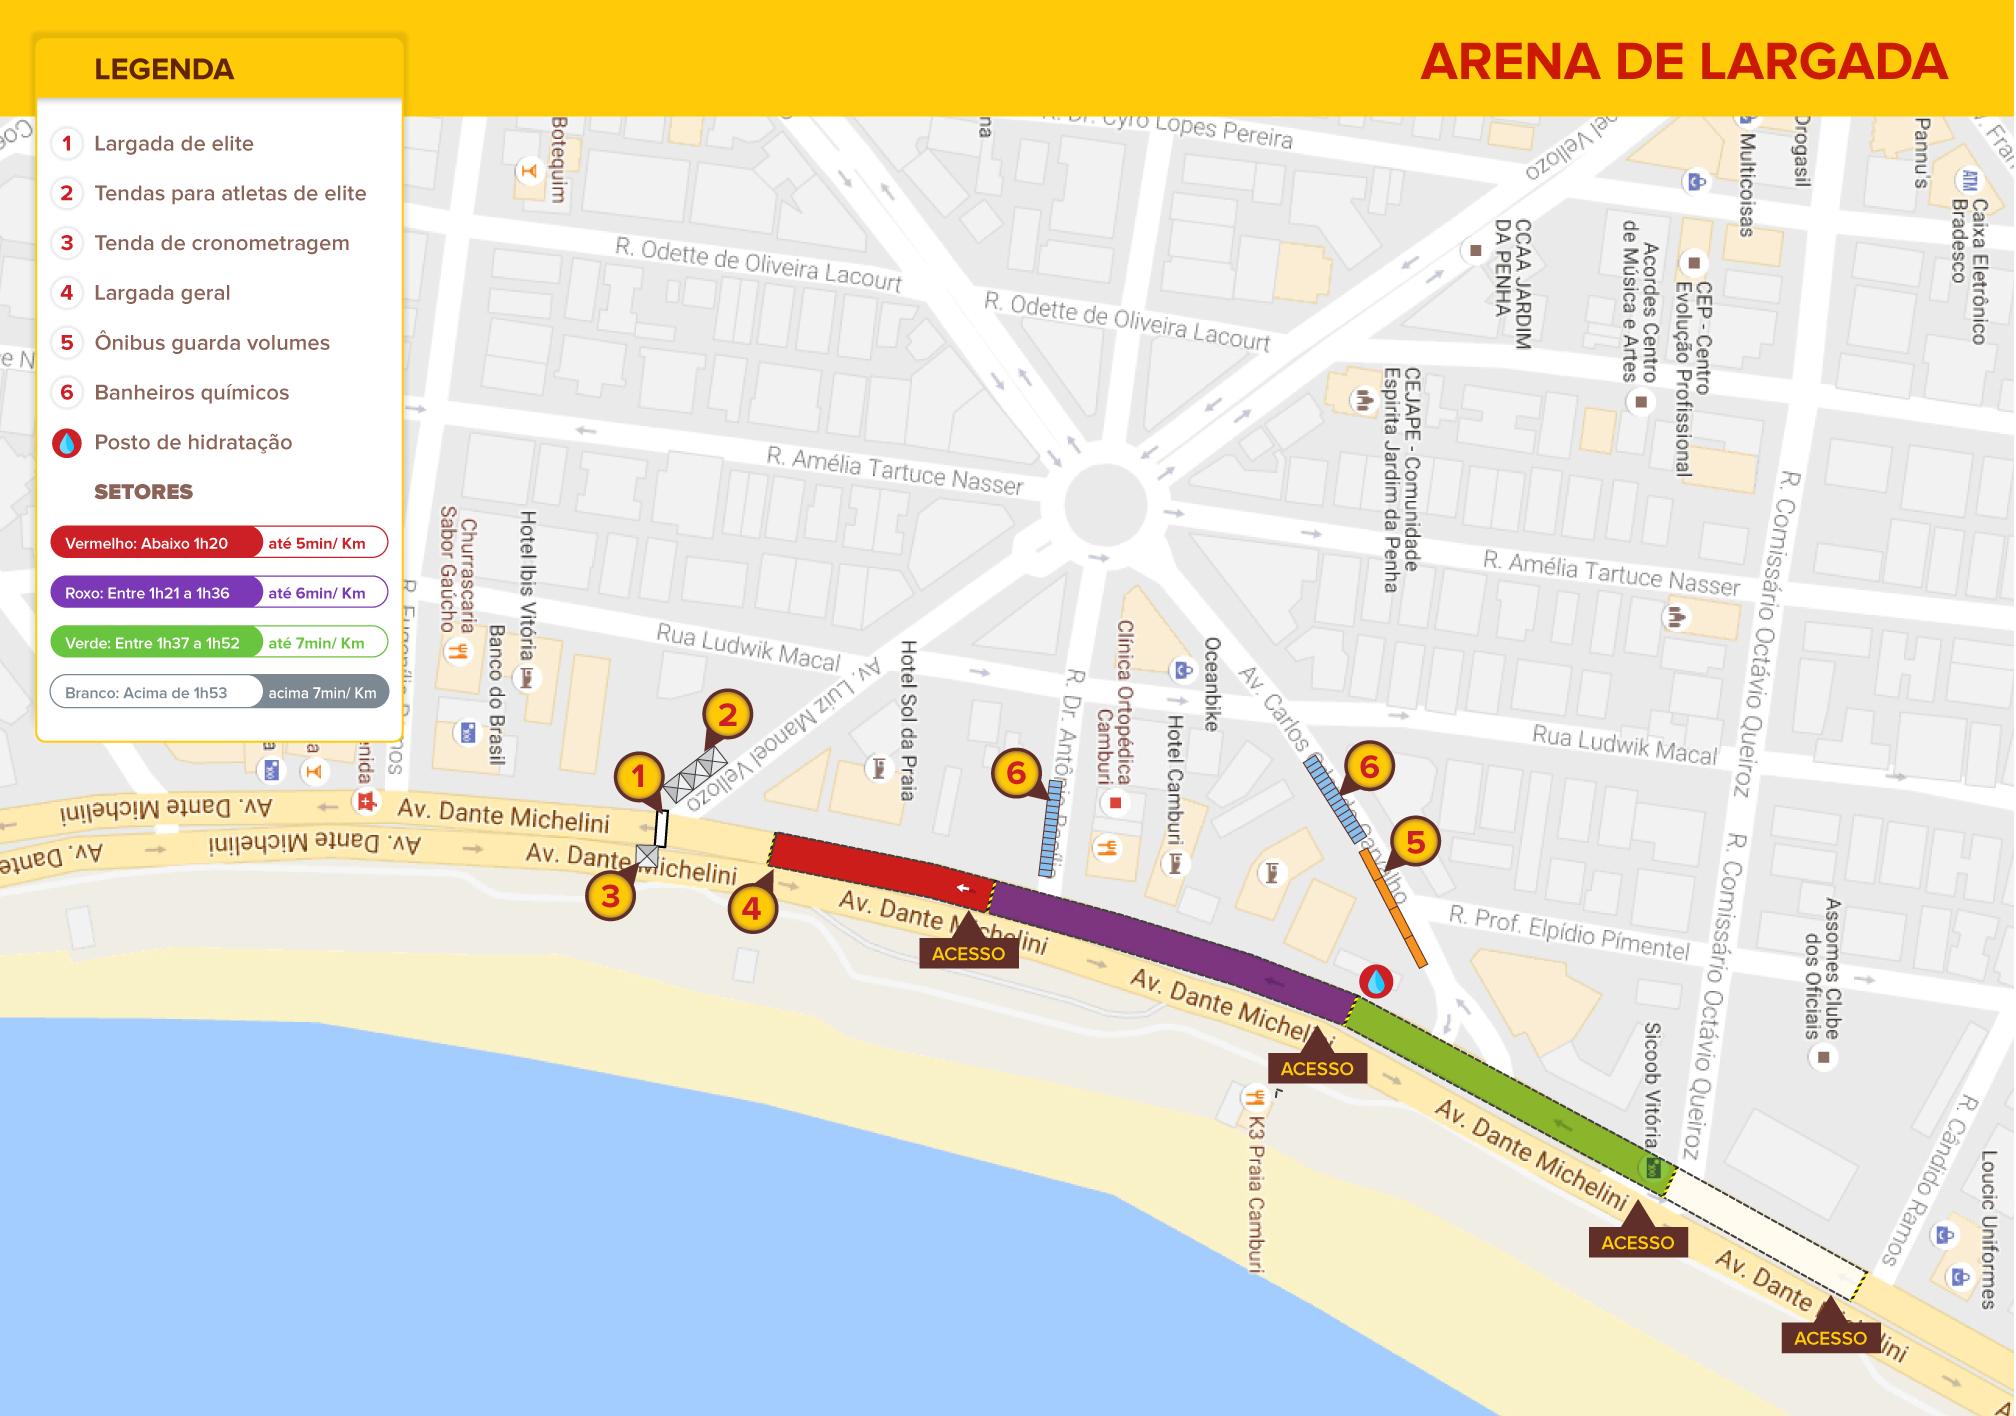 mapa-arena-largada